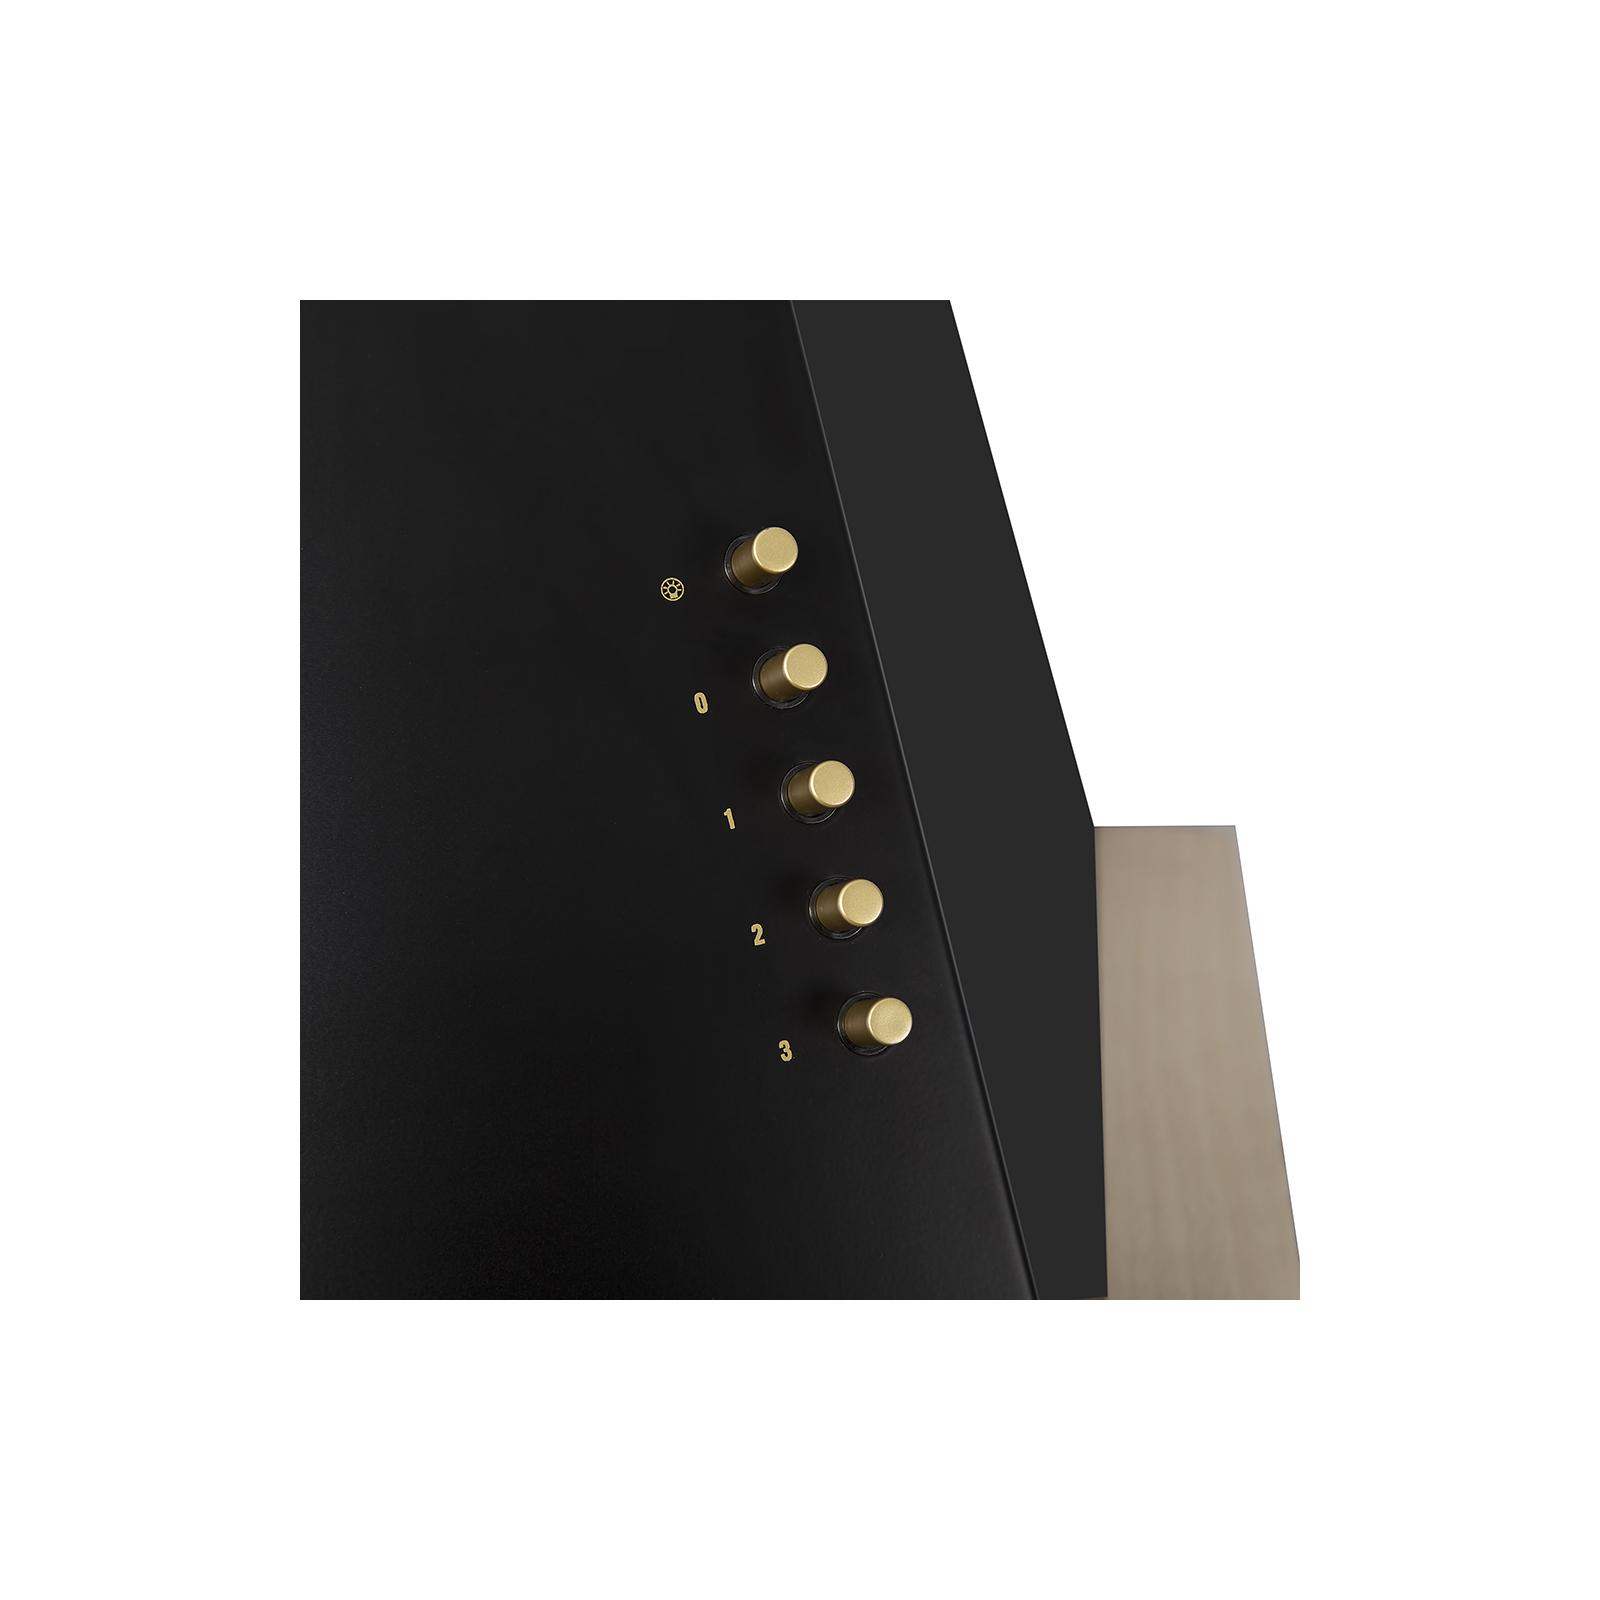 Вытяжка кухонная PERFELLI K 614 Black Country LED изображение 5